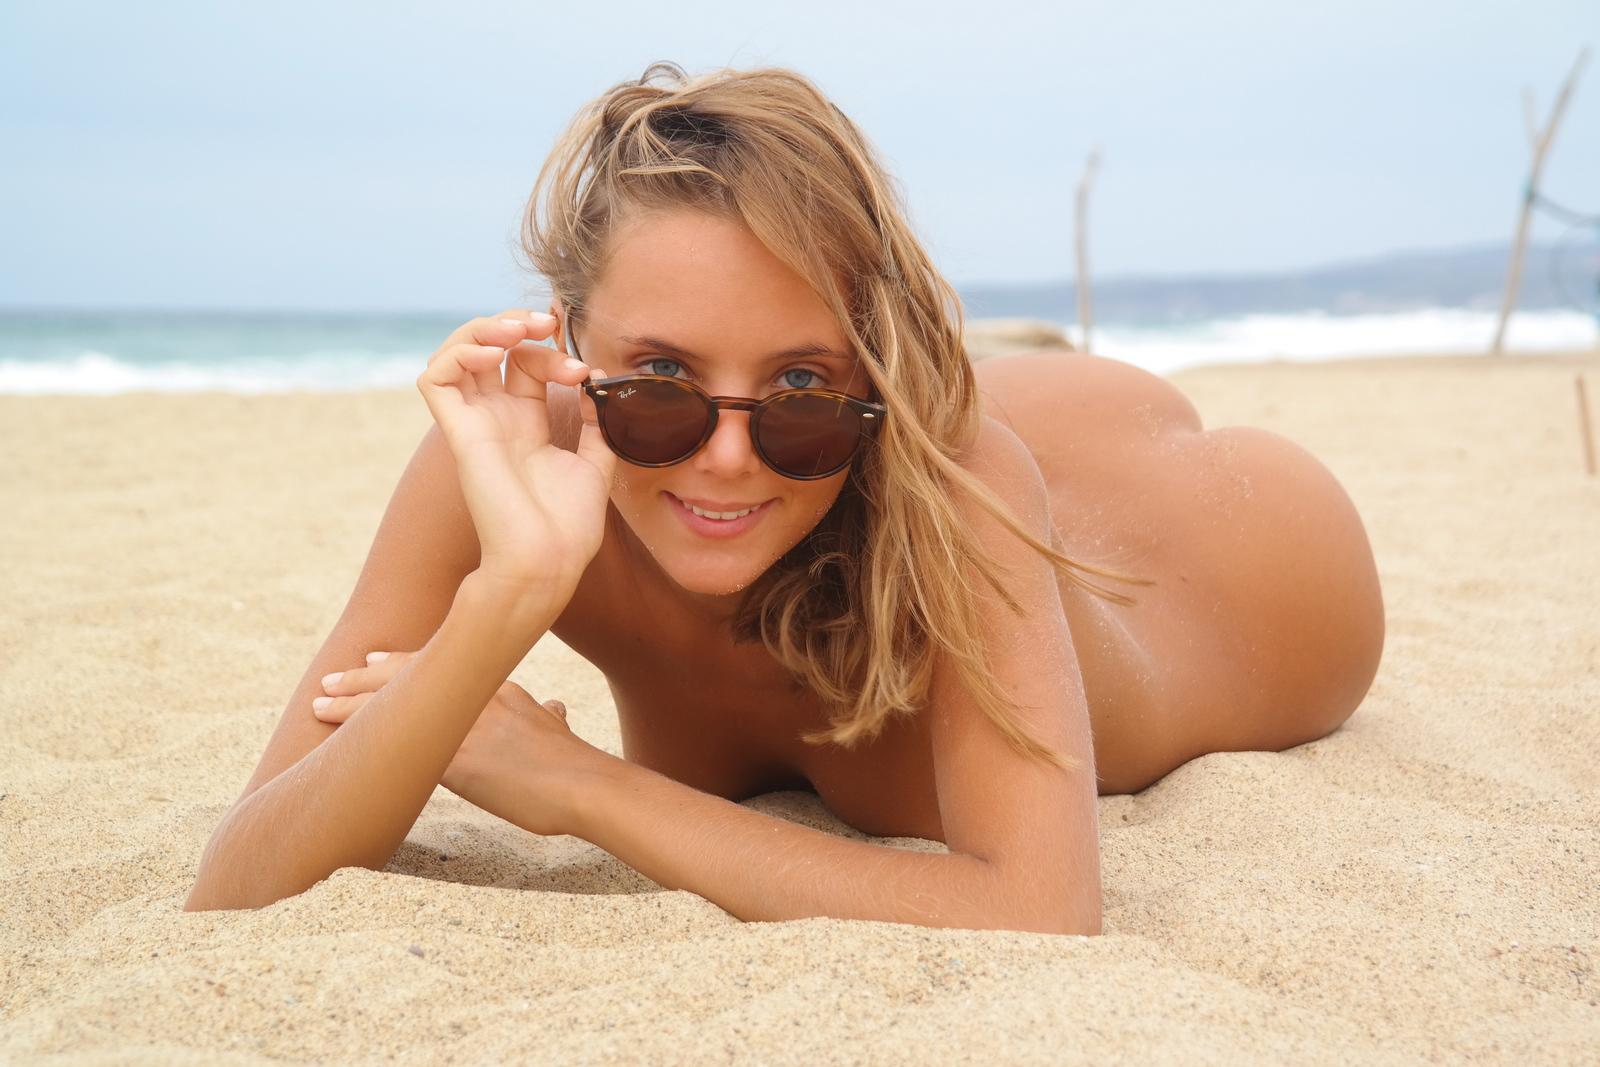 Nude girl beach slim very